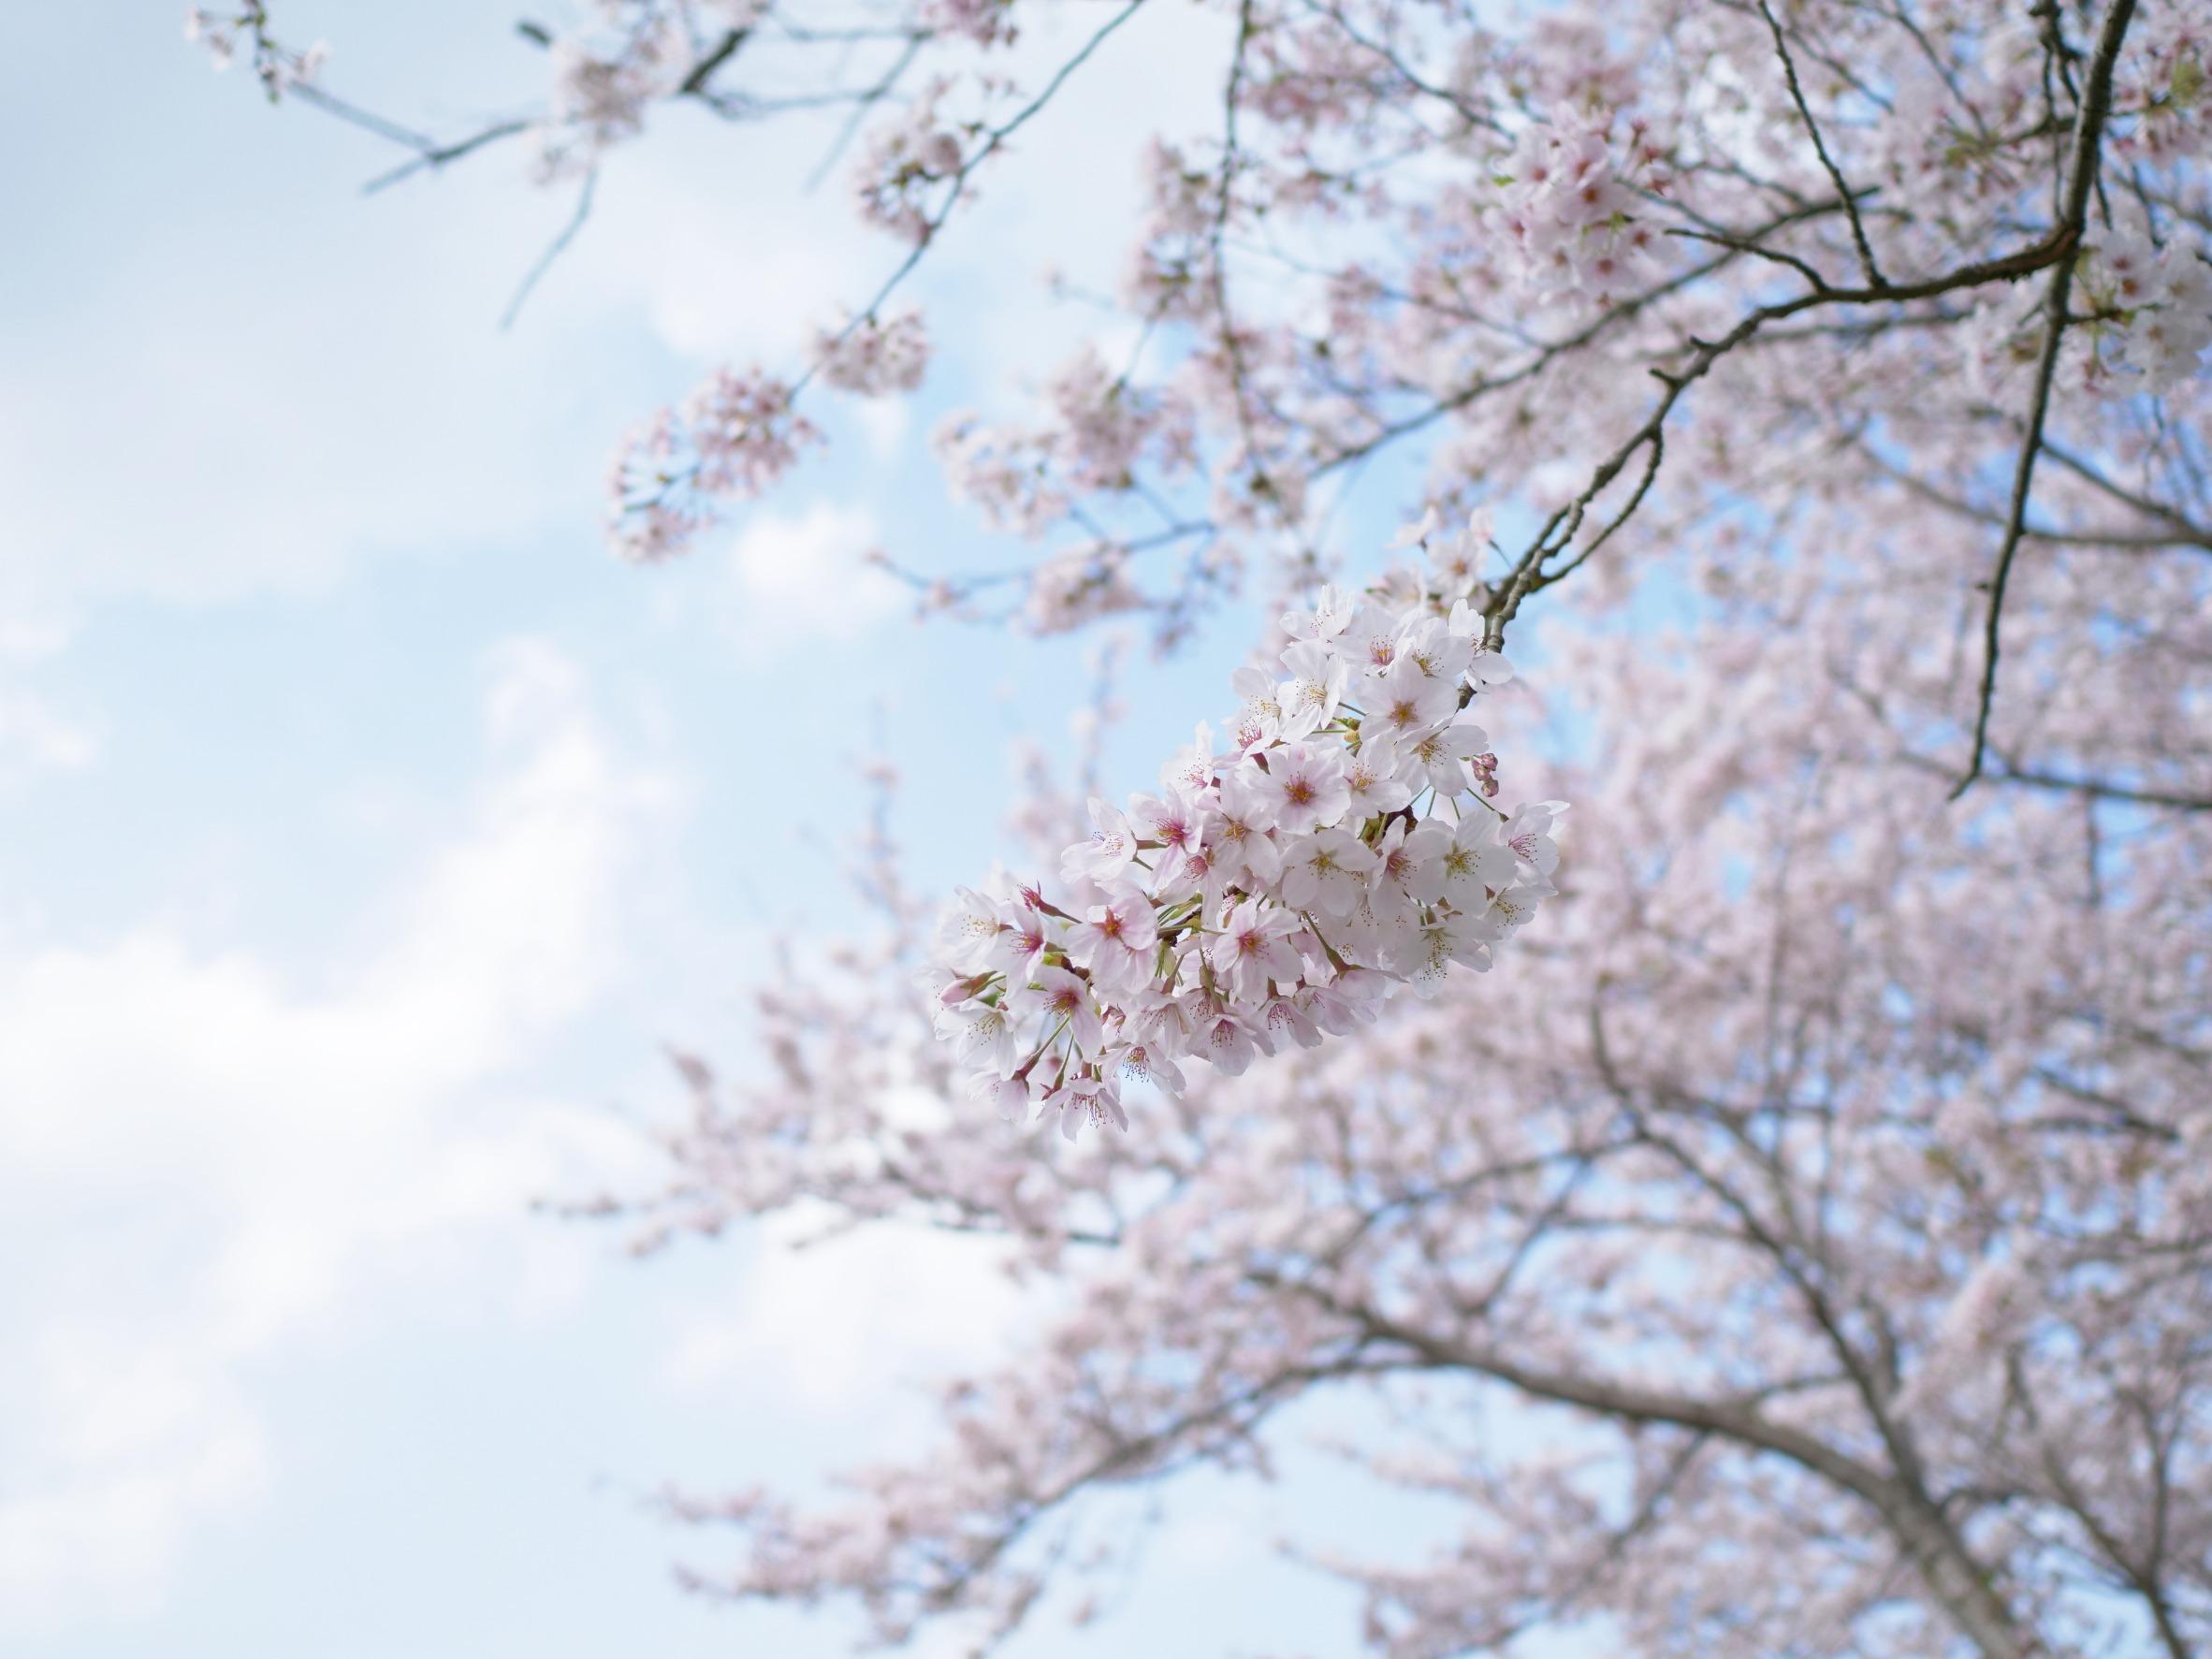 伊勢五十鈴川の桜